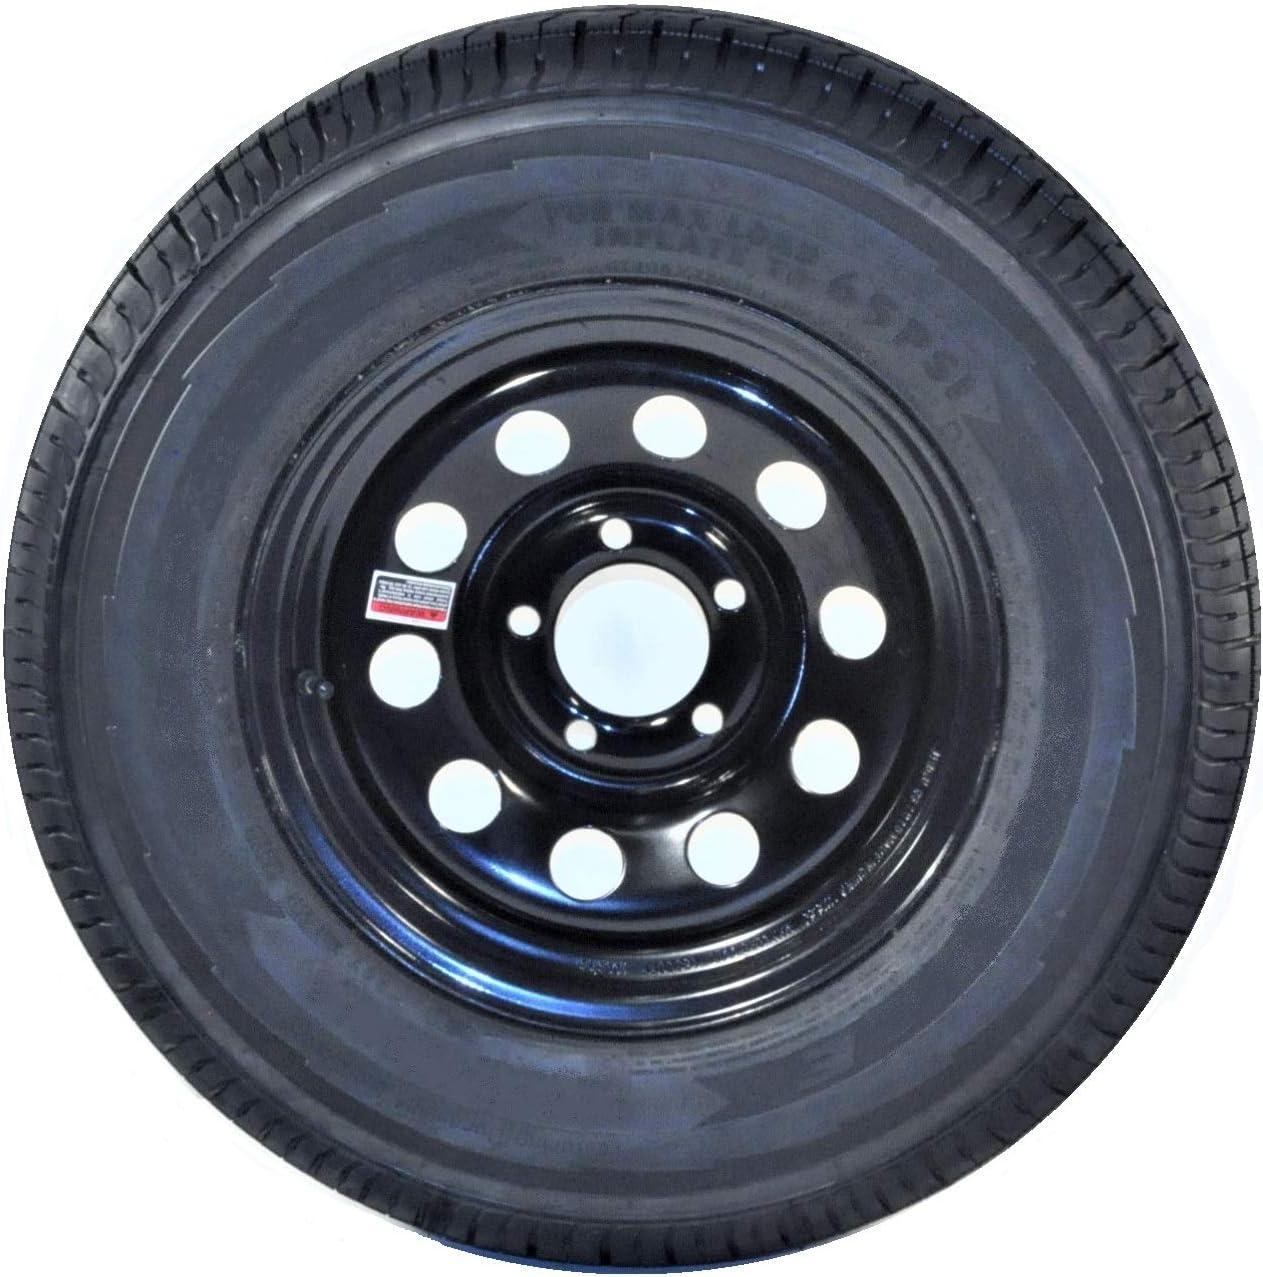 Trailer Tire On Rim 2021 autumn and winter new Bias Ply ST175 80D13 80 175 13 5-4.5 LRC Regular dealer Bla